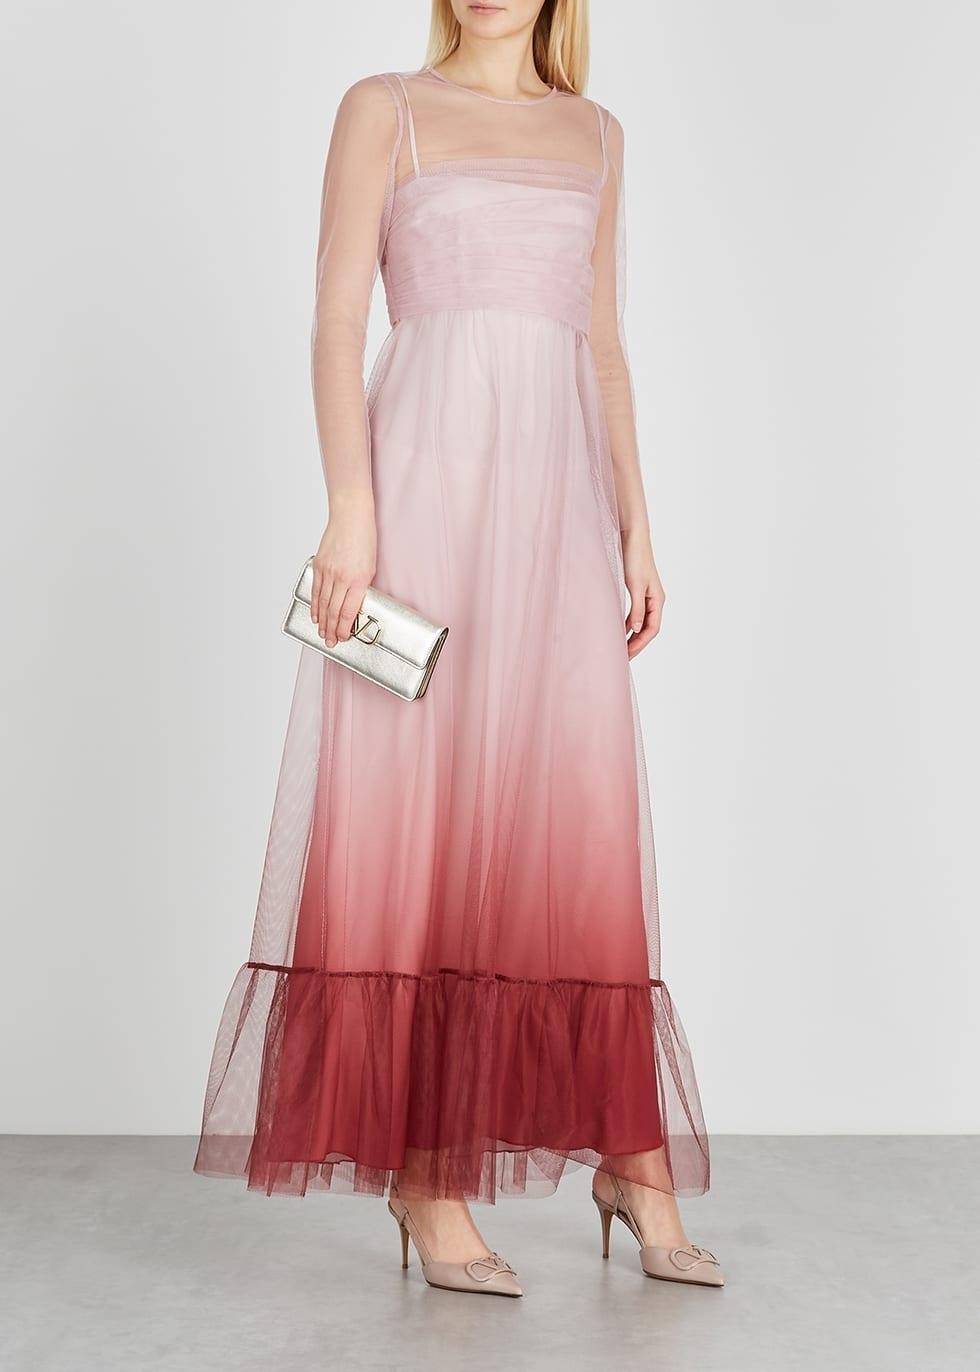 RED VALENTINO Pink Dégradé Tulle Maxi Dress